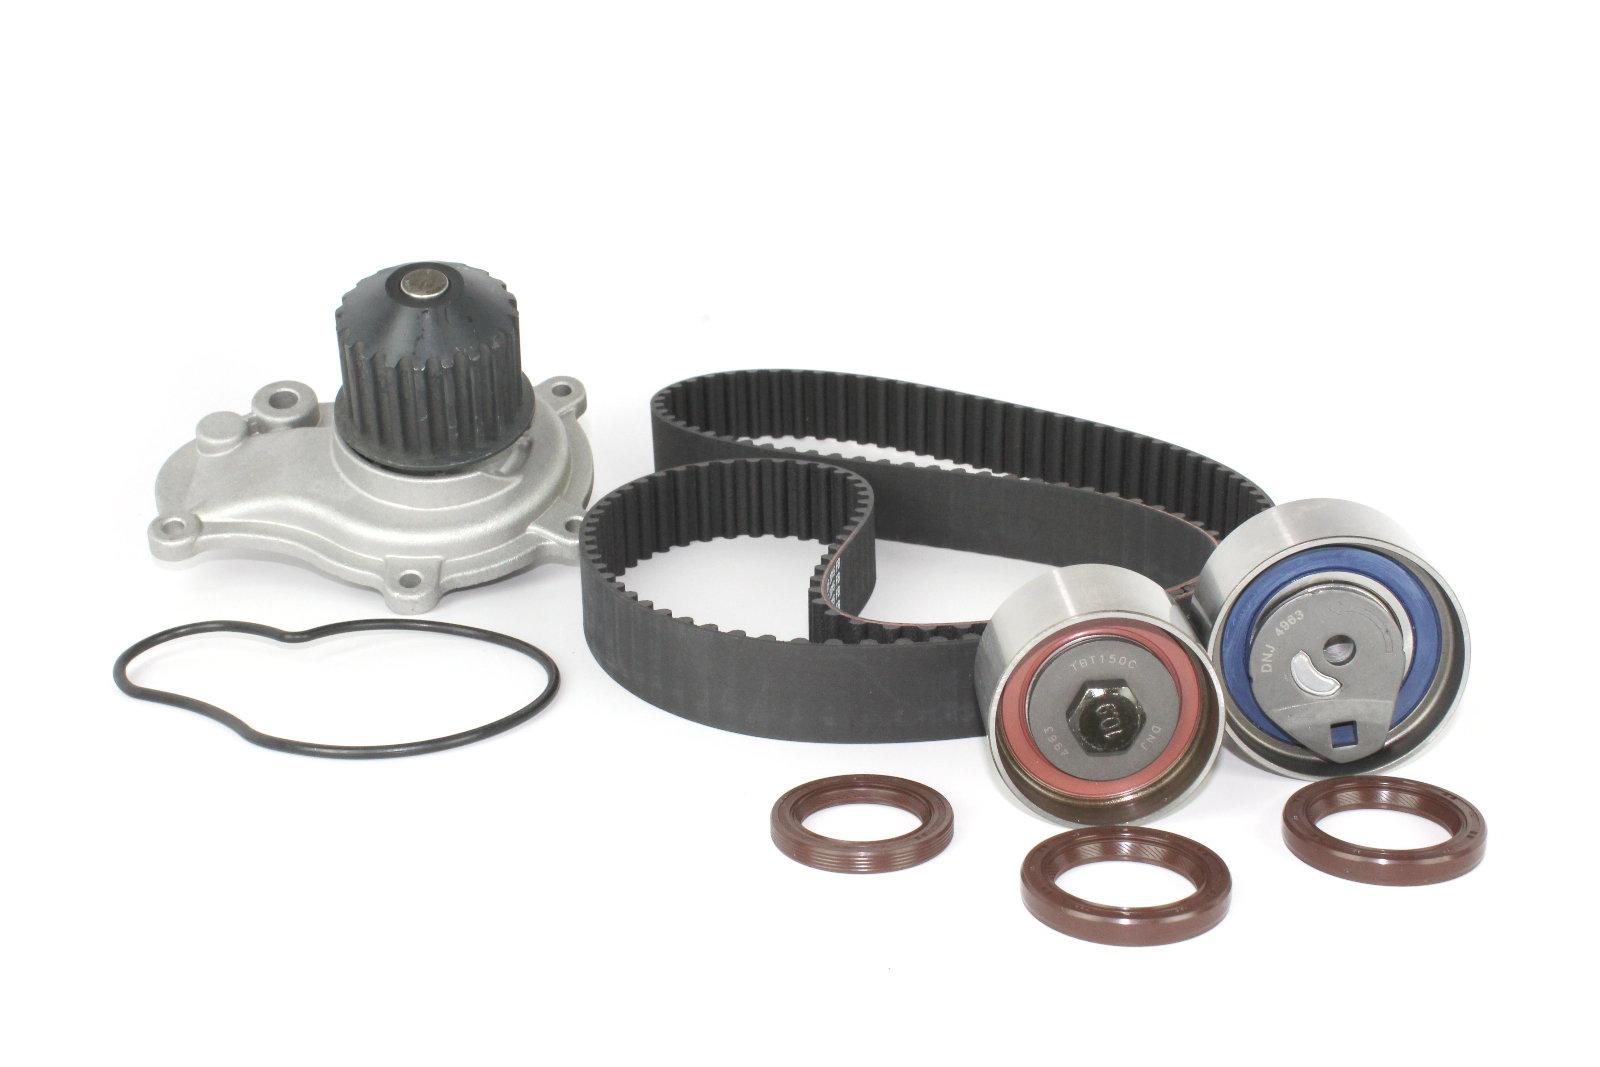 Dodge Caravan Timing Belt Kit With Water Pump 2003 to 2007 - 2.4 Liter DOHC